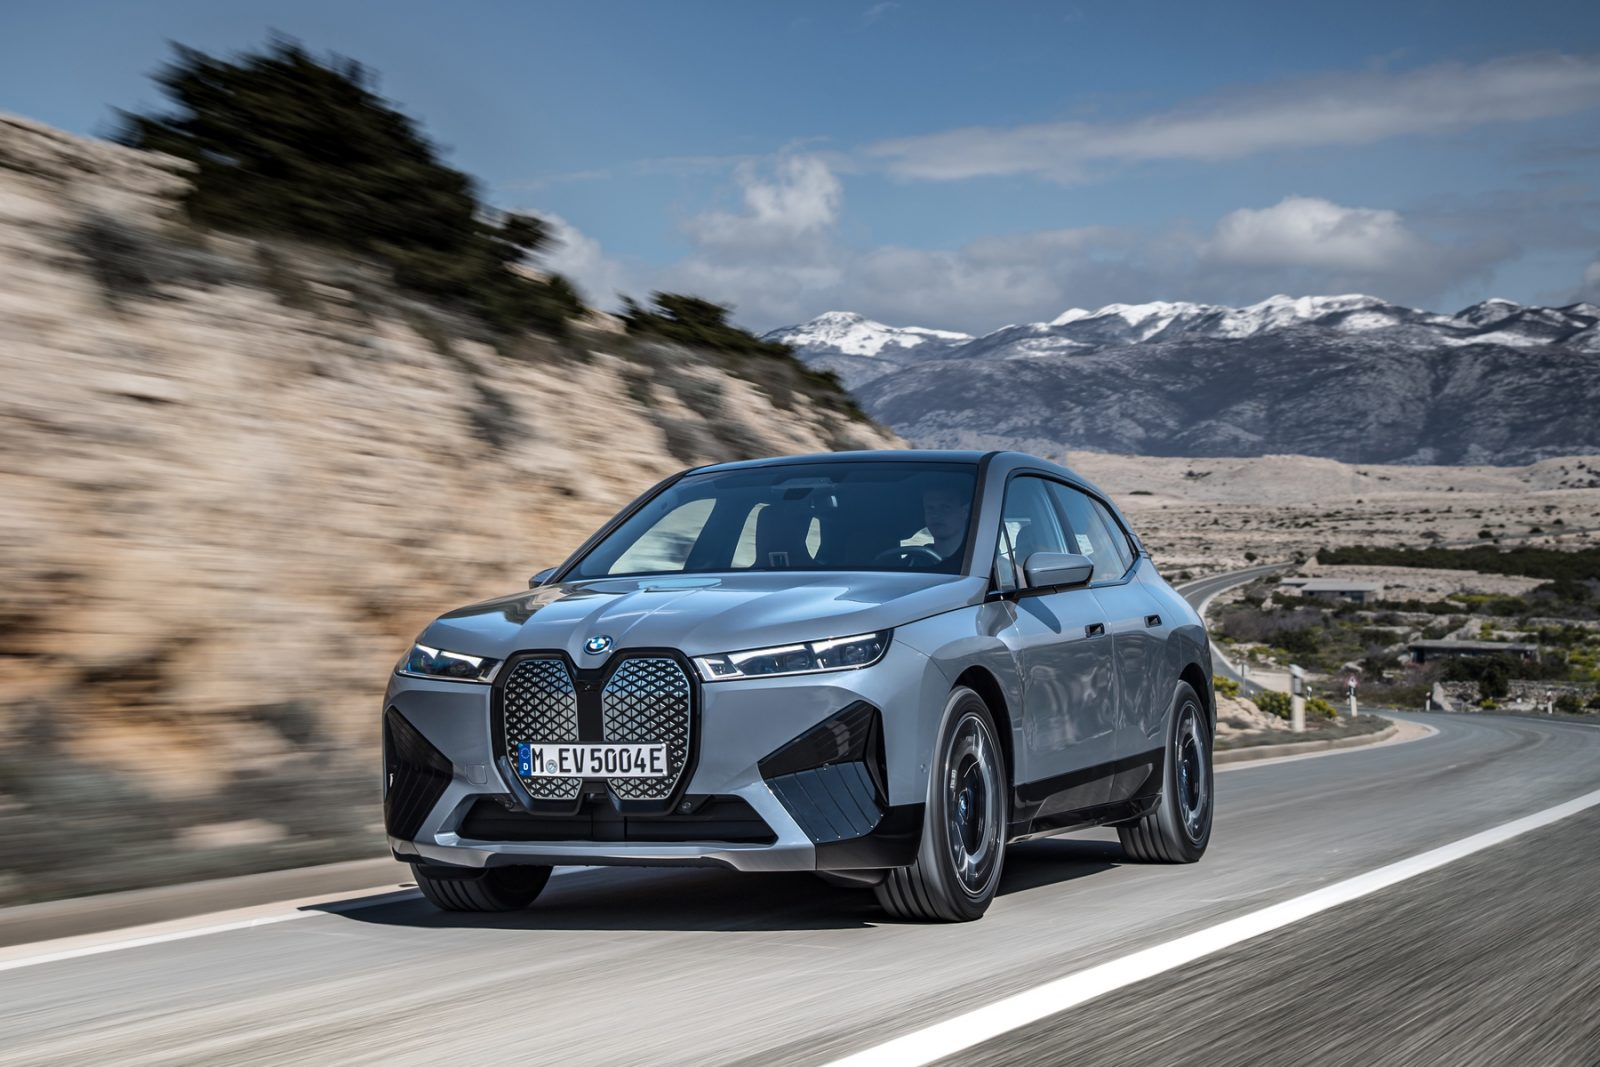 2022 BMW Model Updates